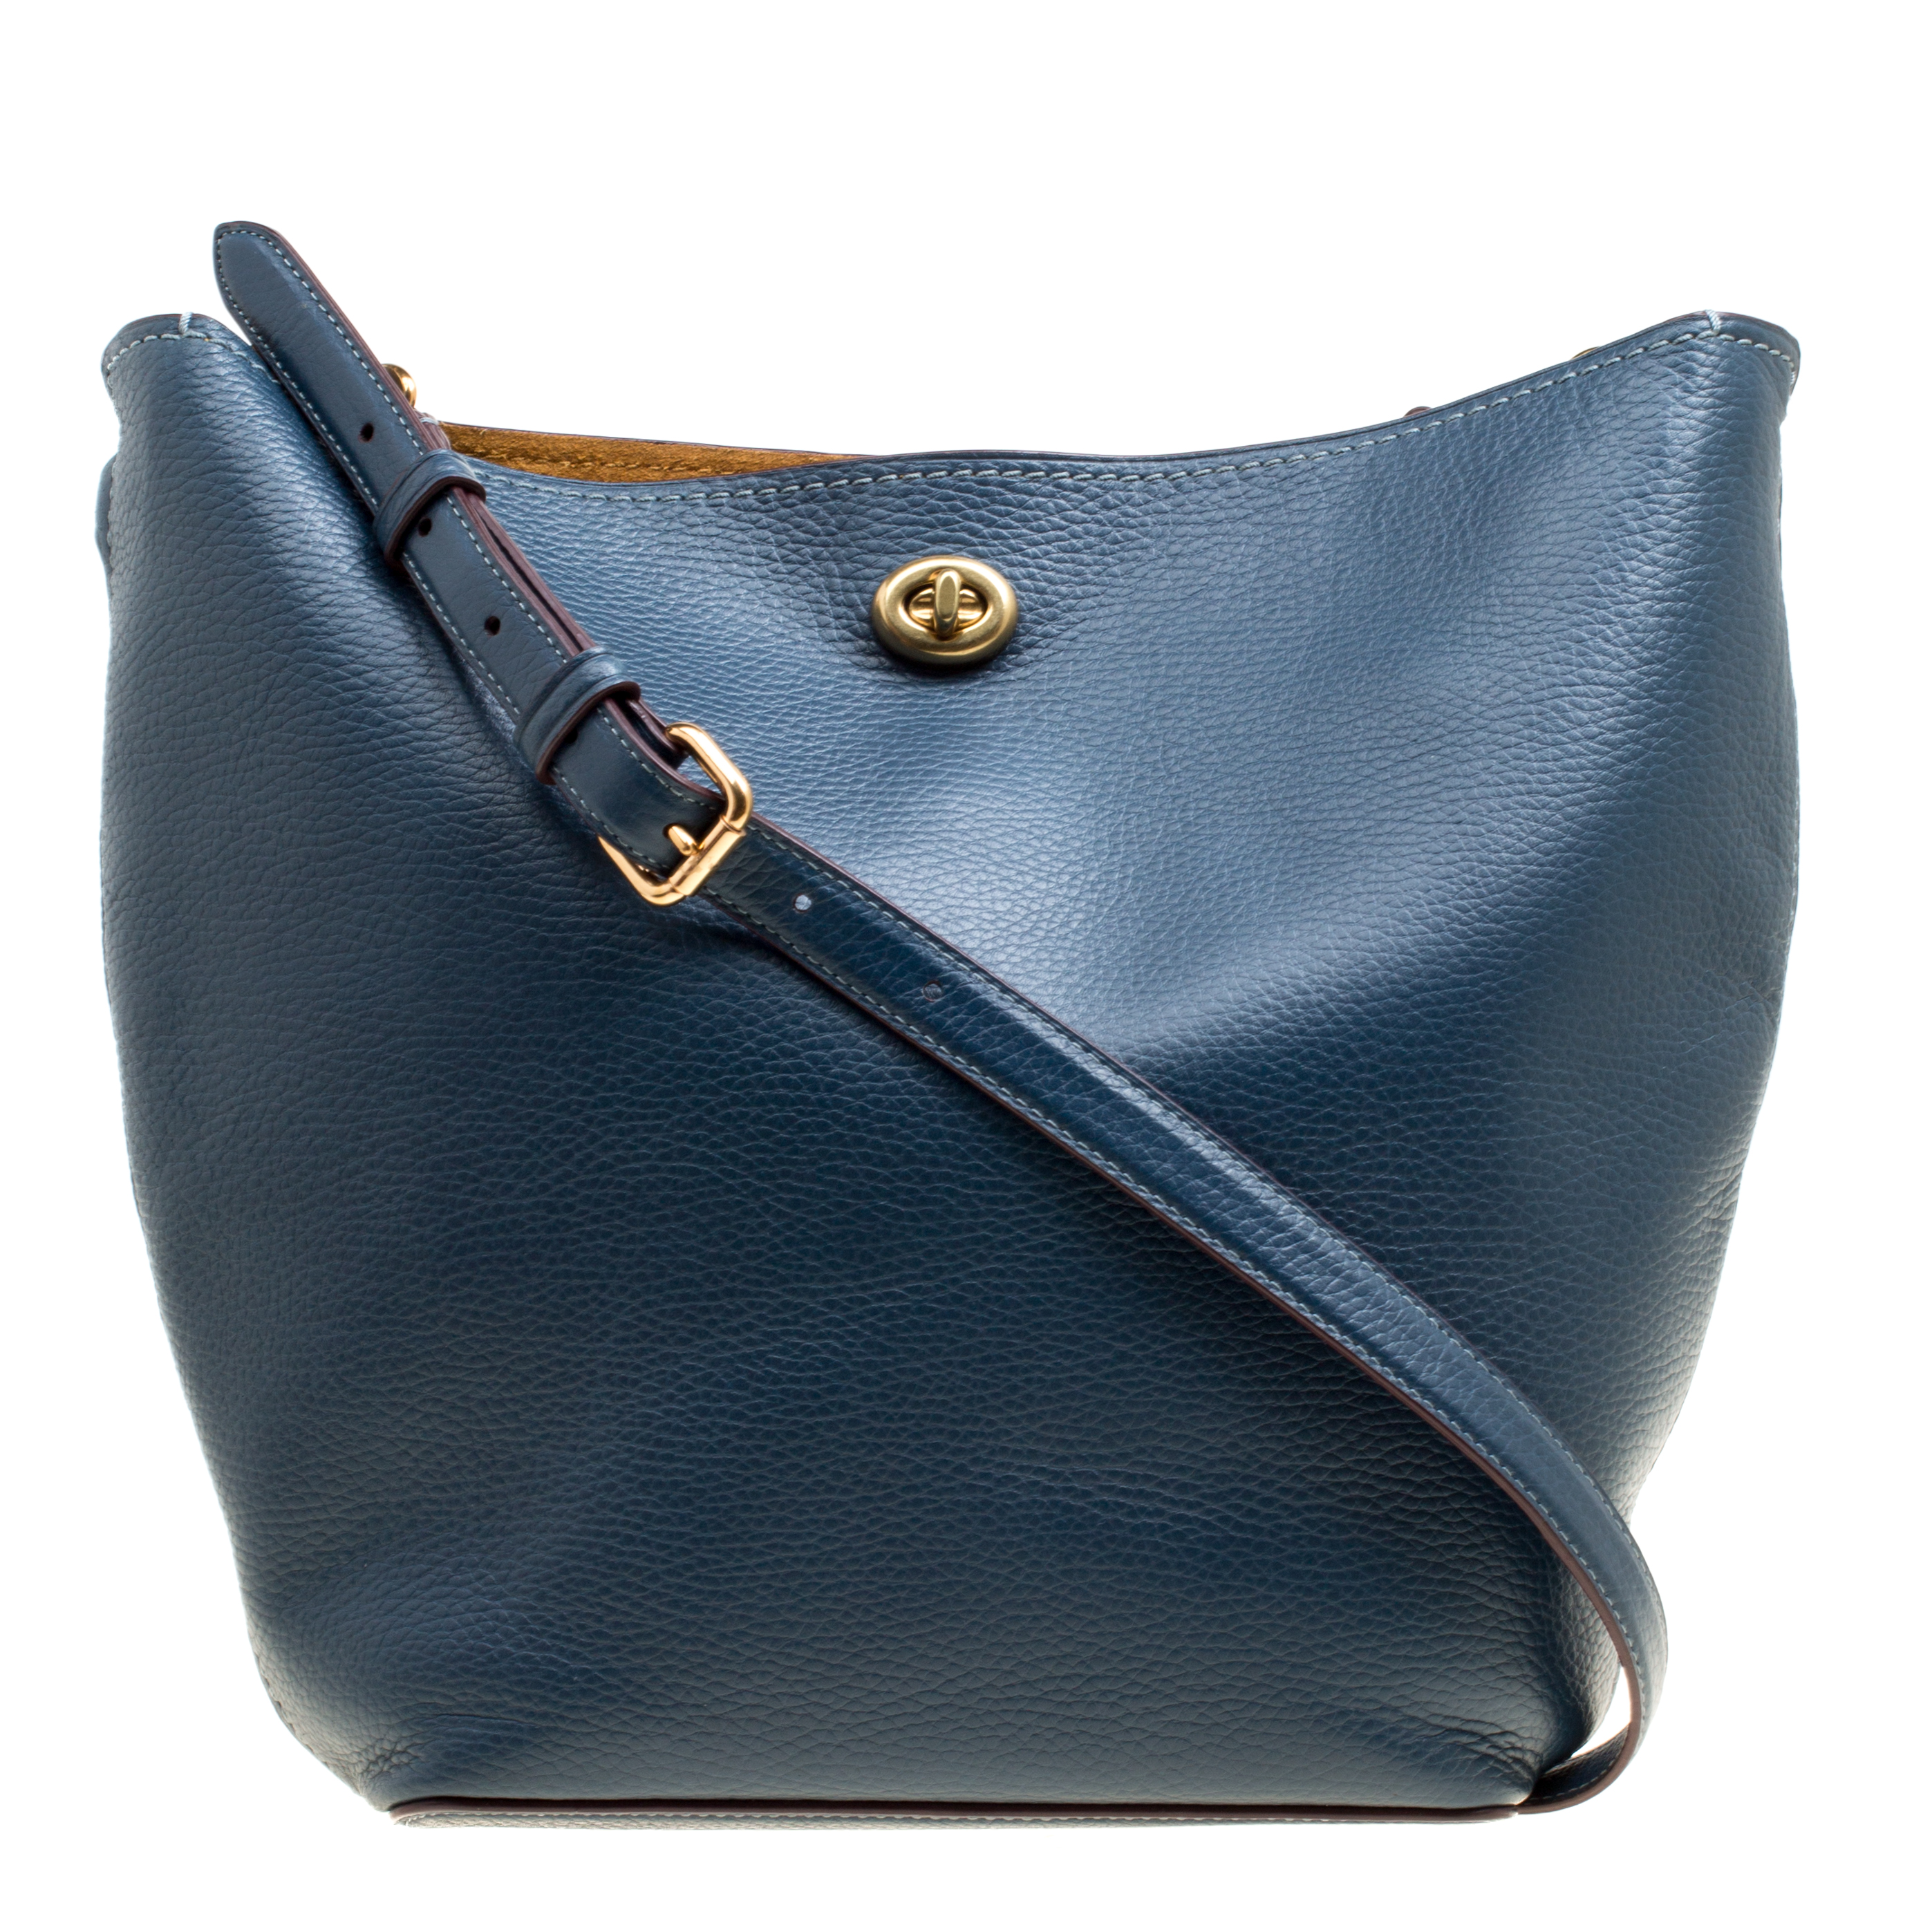 ... Coach Teal Blue Pebbled Leather Bucket Shoulder Bag. nextprev. prevnext 1ddd2bb3d0e4d